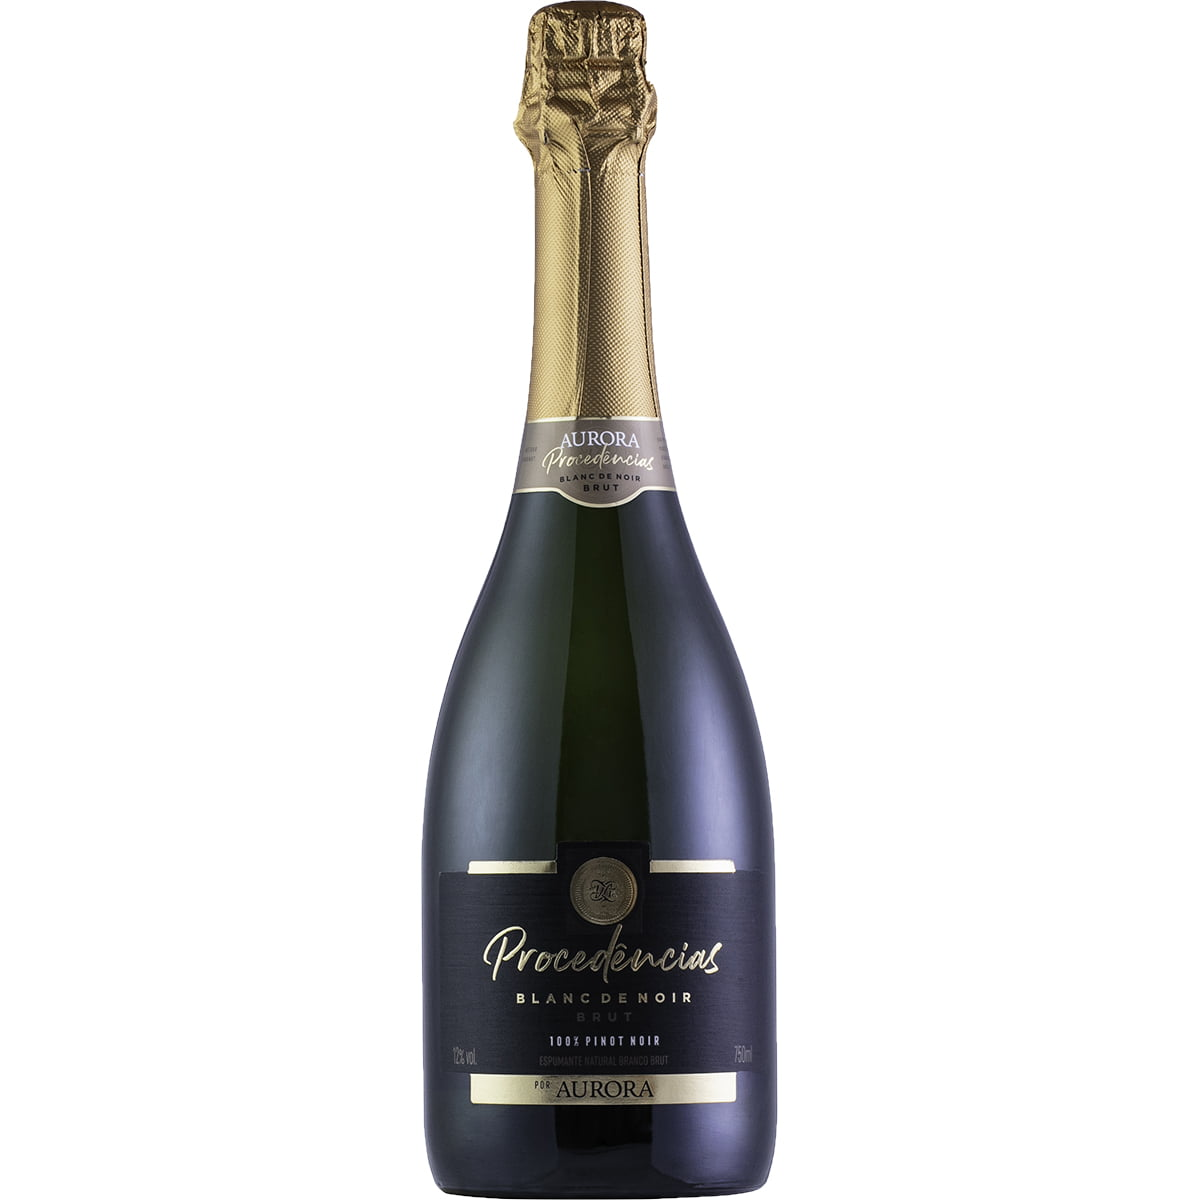 Espumante Aurora Procedências Brut Pinot Noir 750ml